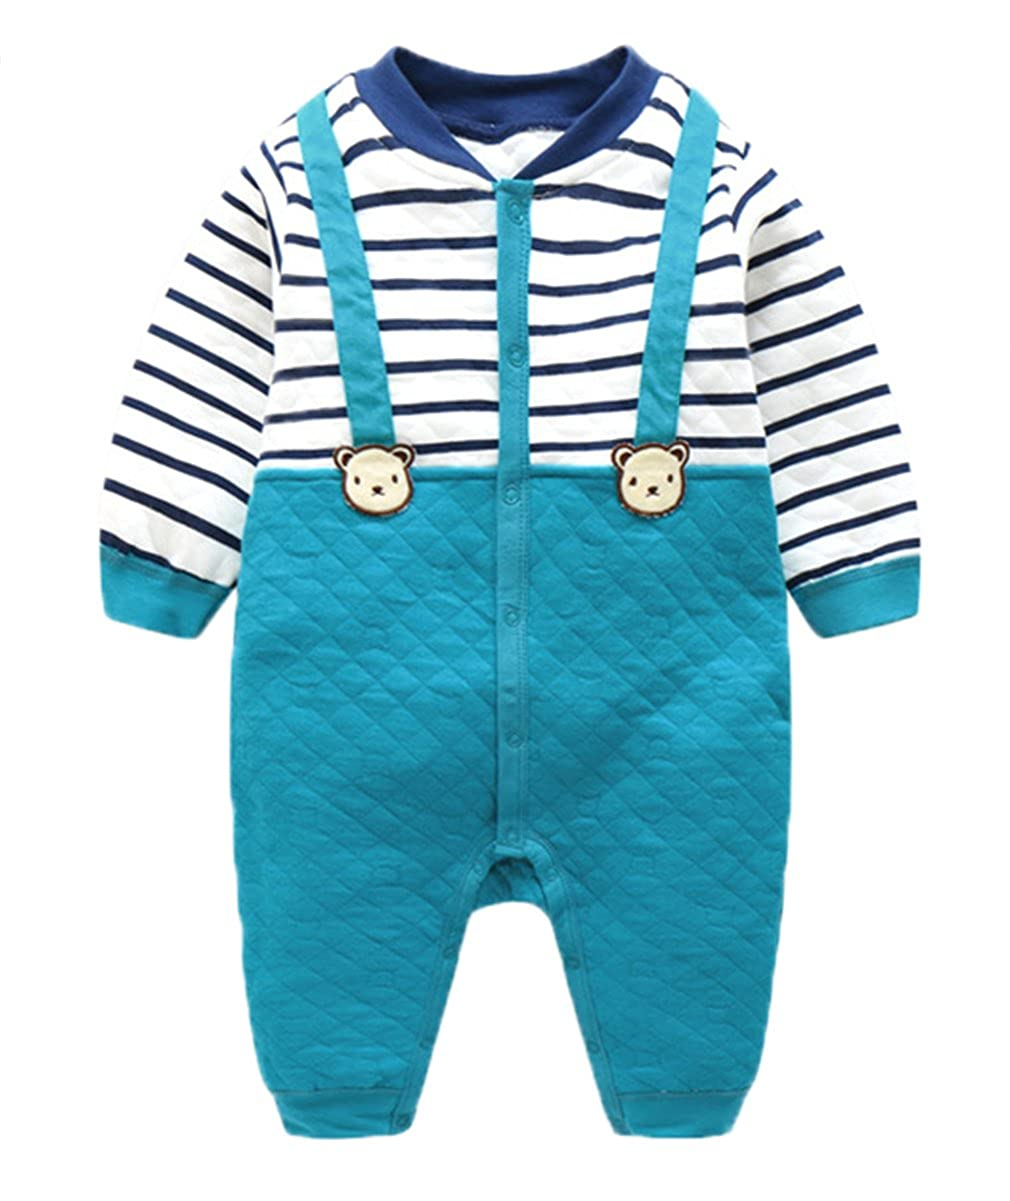 La Vogue Pelele Bebé Niño Niña Traje Camisa para Primavera ...